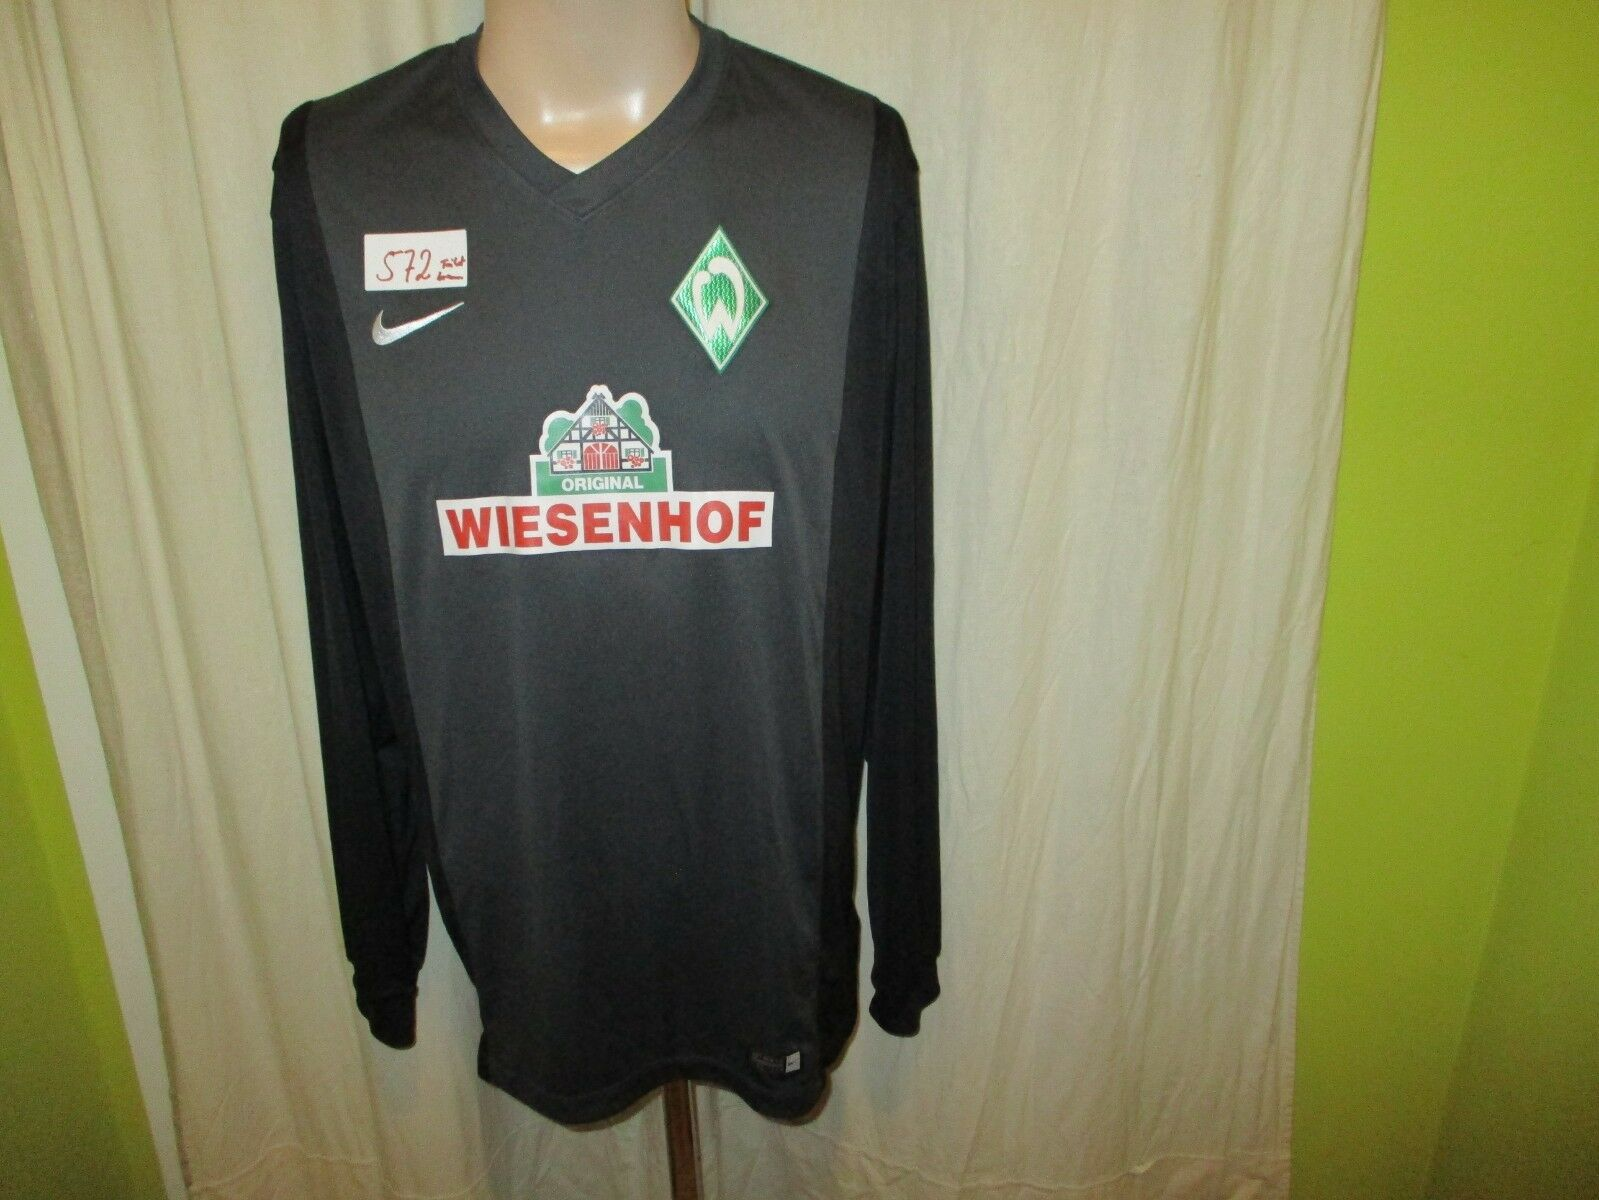 Werder Bremen Nike Langarm Junior Matchworn Matchworn Matchworn Trikot 2017 18 + Nr.2 Gr.L RARITÄT de285a